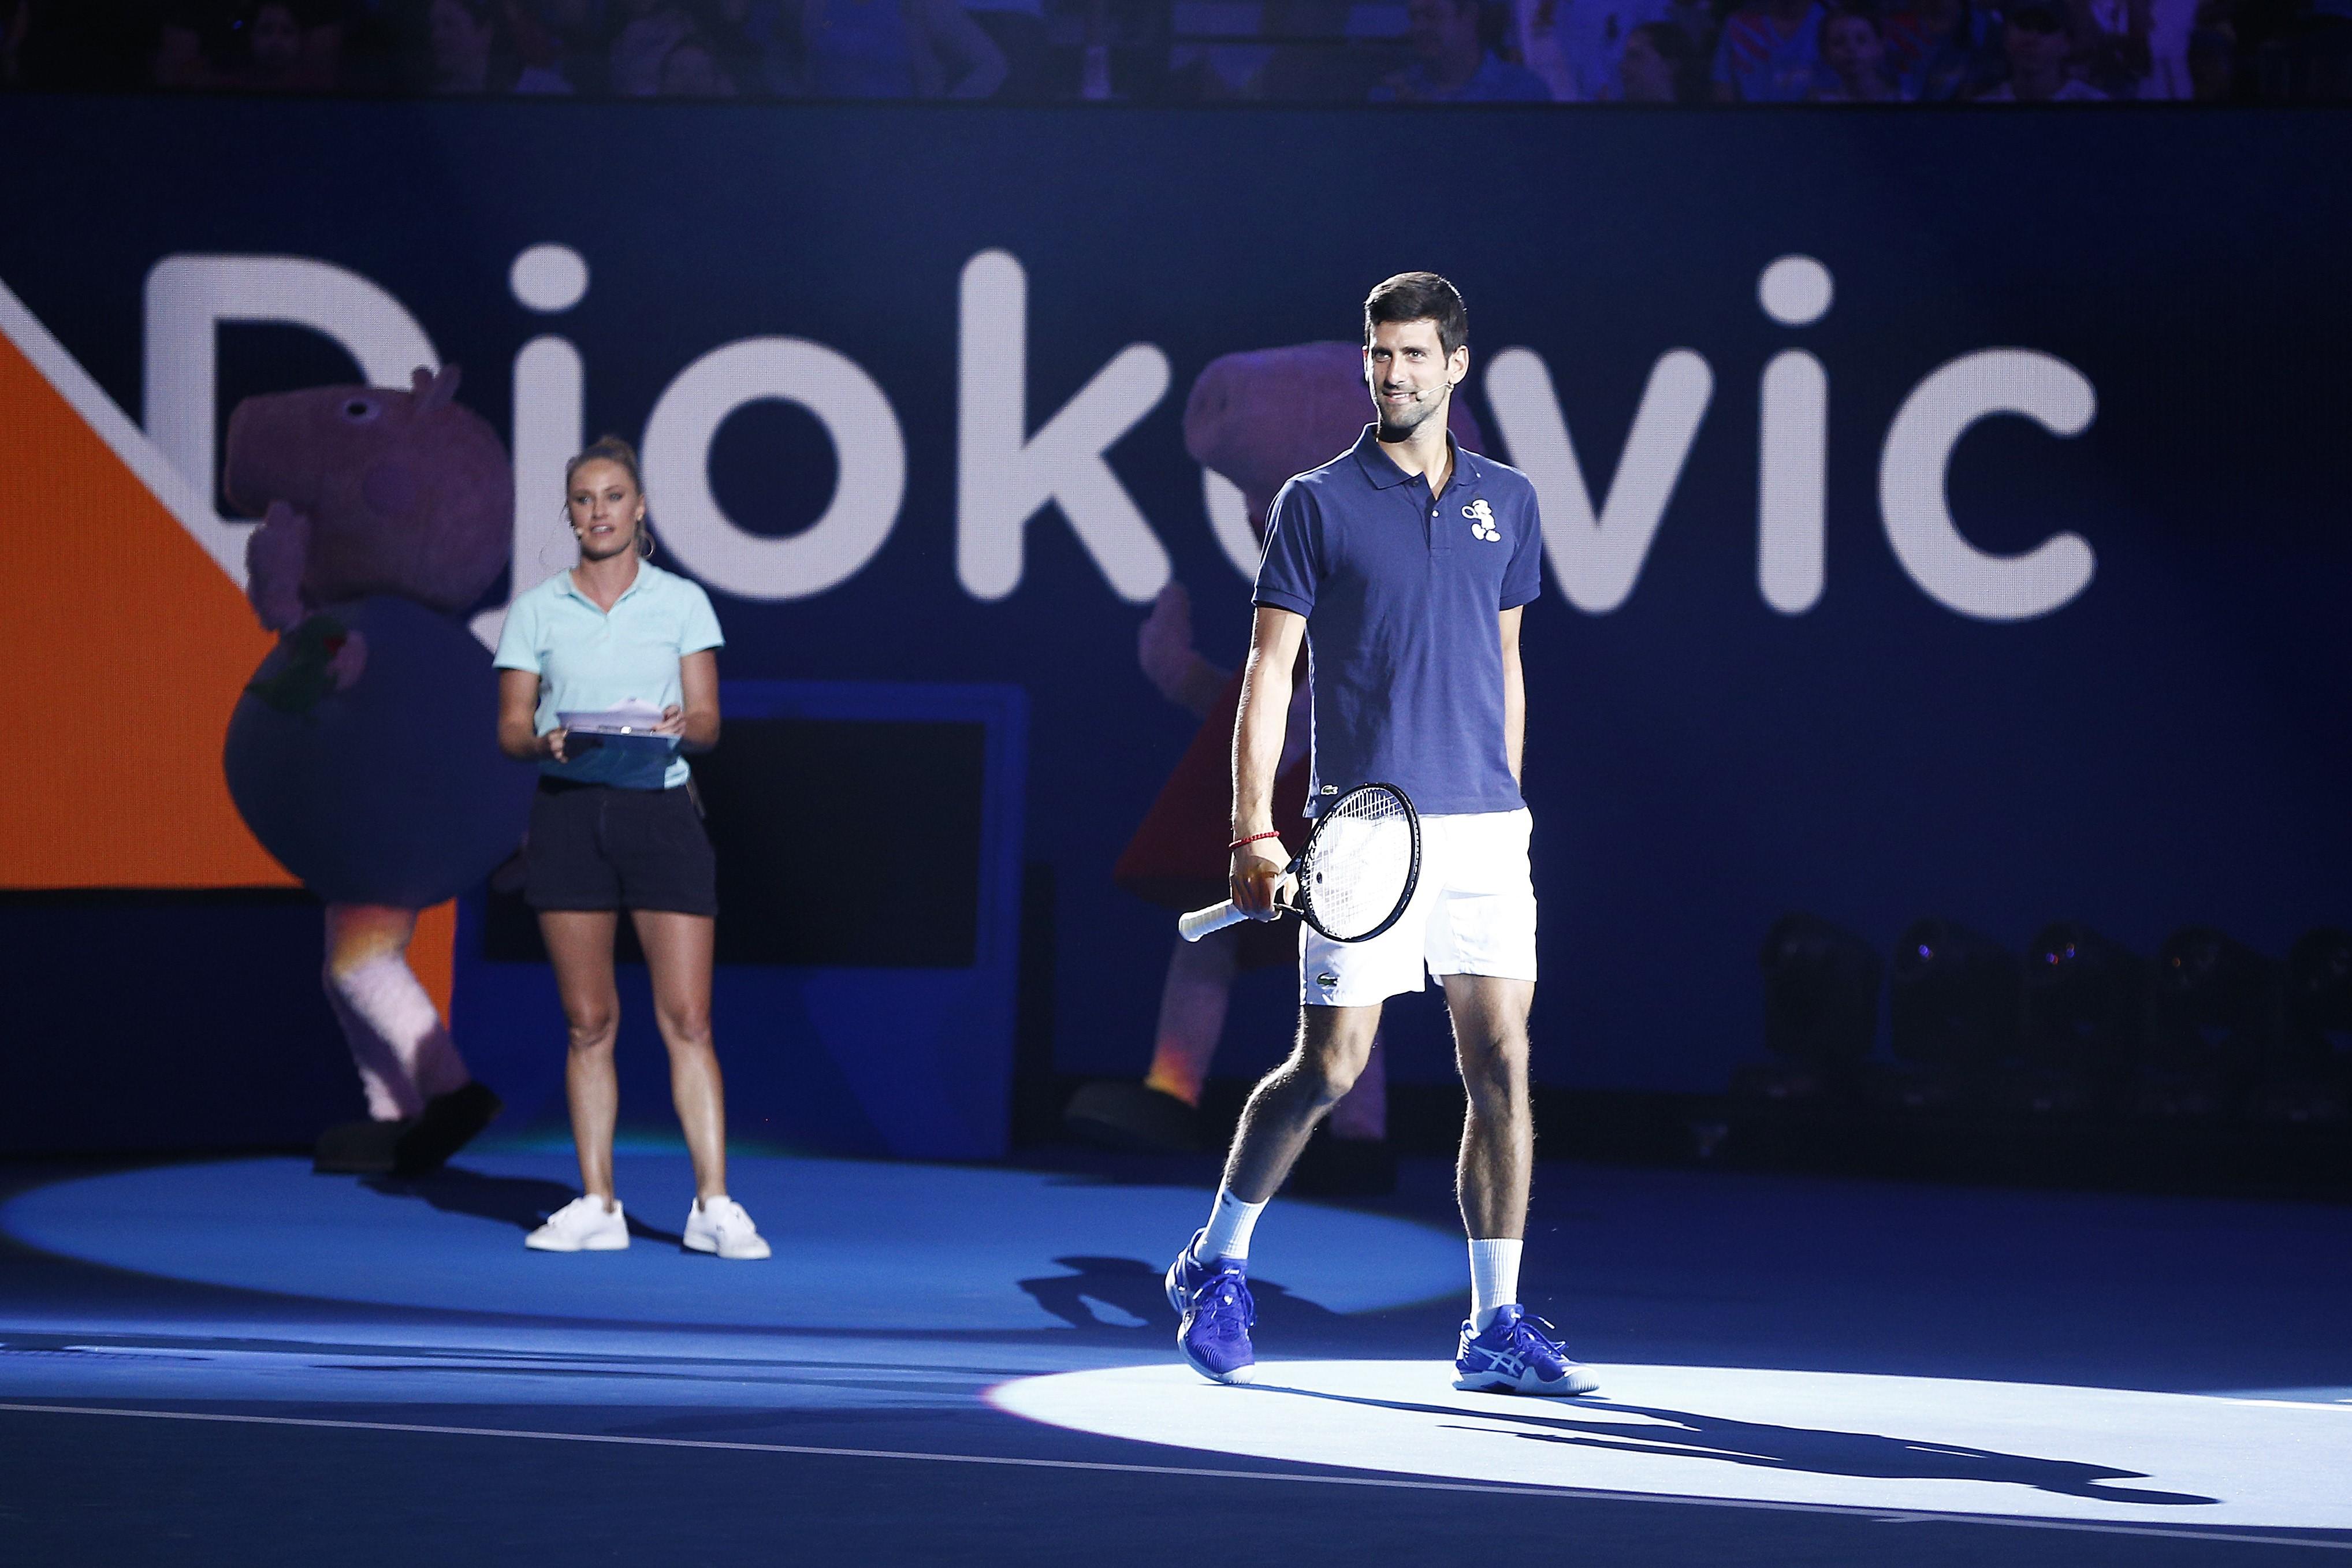 Novak Djokovic lors du Kids Day de l'Open d'Australie 2019